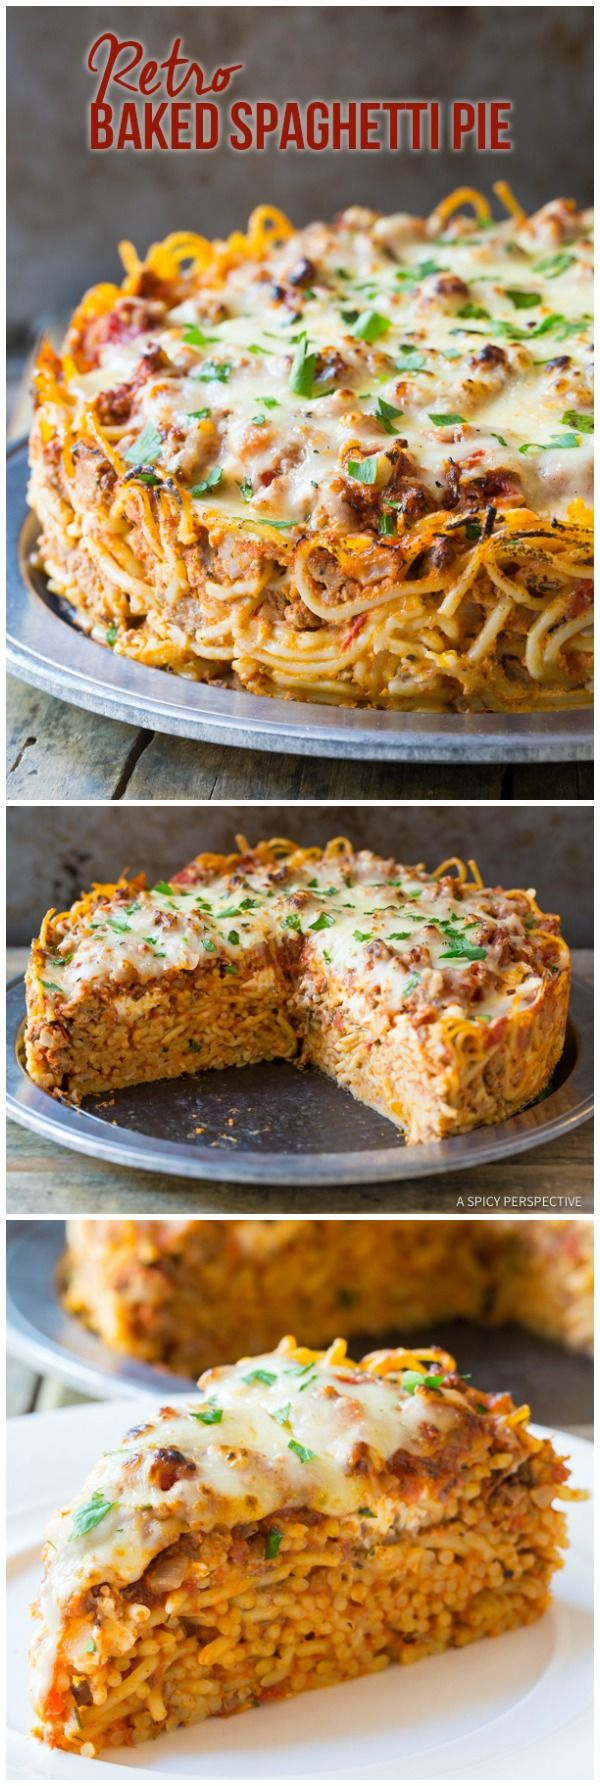 Retro+Baked+Spaghetti+Pie+Recipe+|+ASpicyPerspective.com+#retro+via+@spicyperspectiv